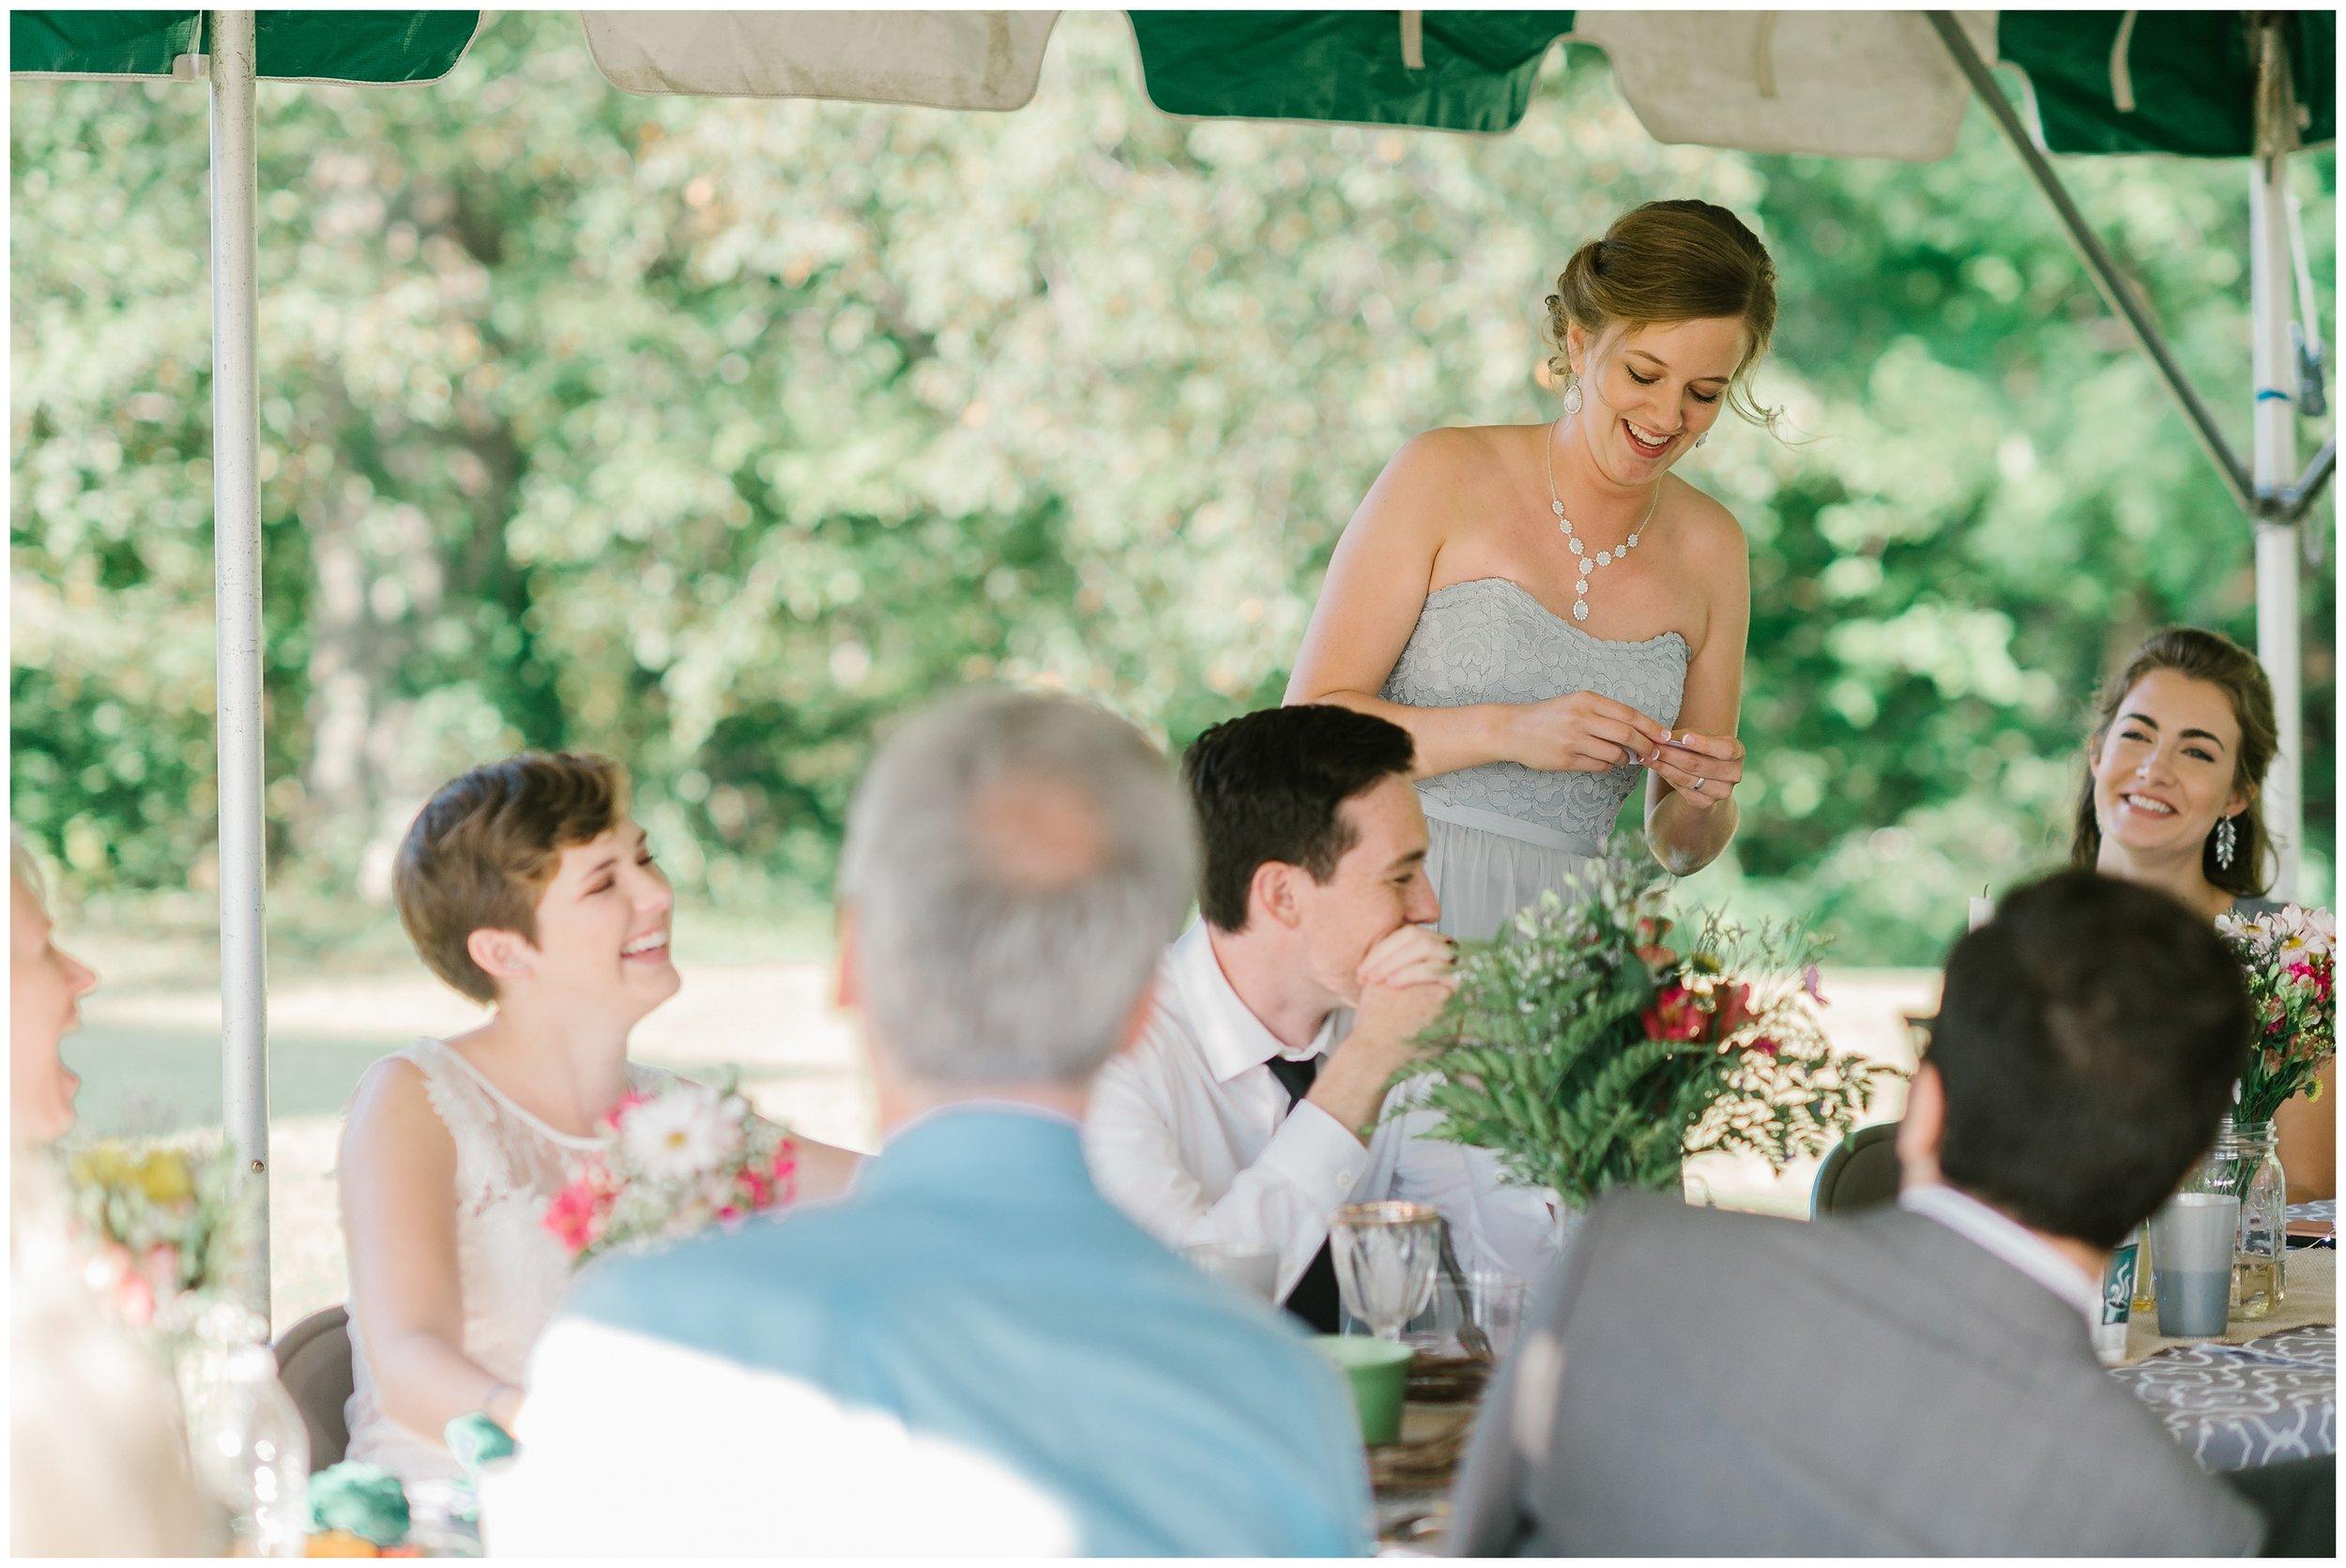 Rebecca_Shehorn_Photography_Indianapolis_Wedding_Photographer_7274.jpg